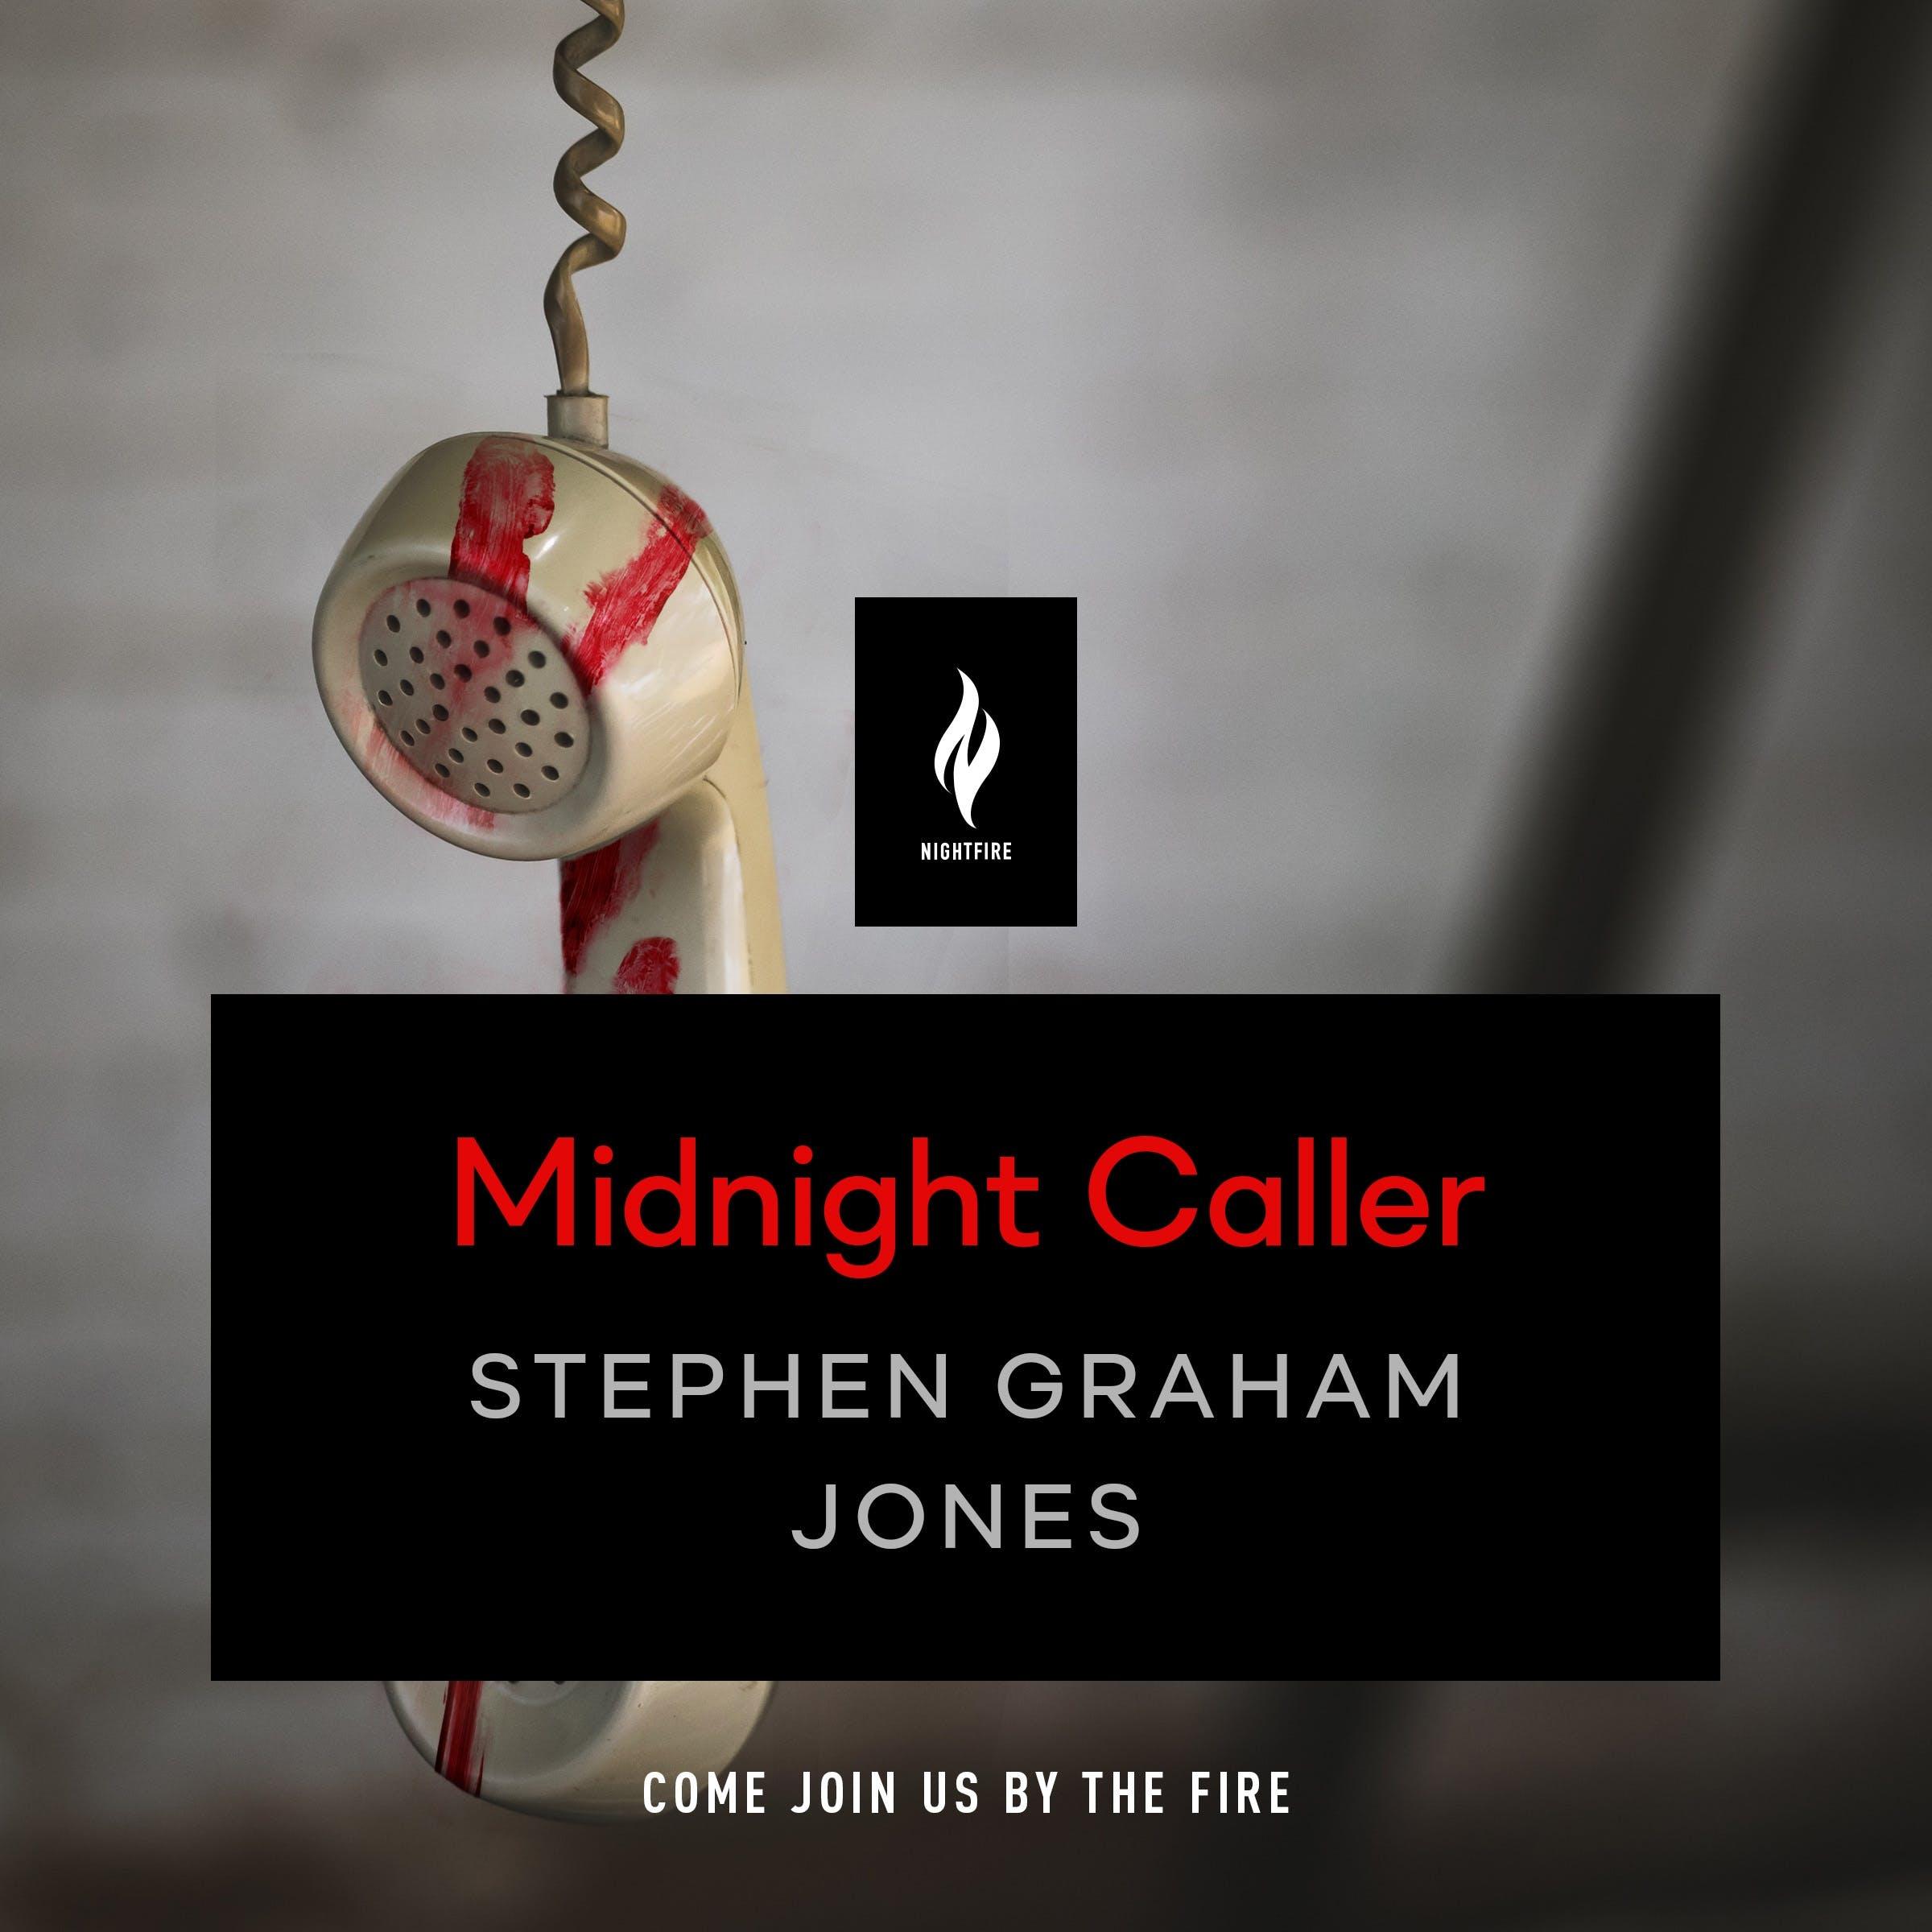 Image of Midnight Caller